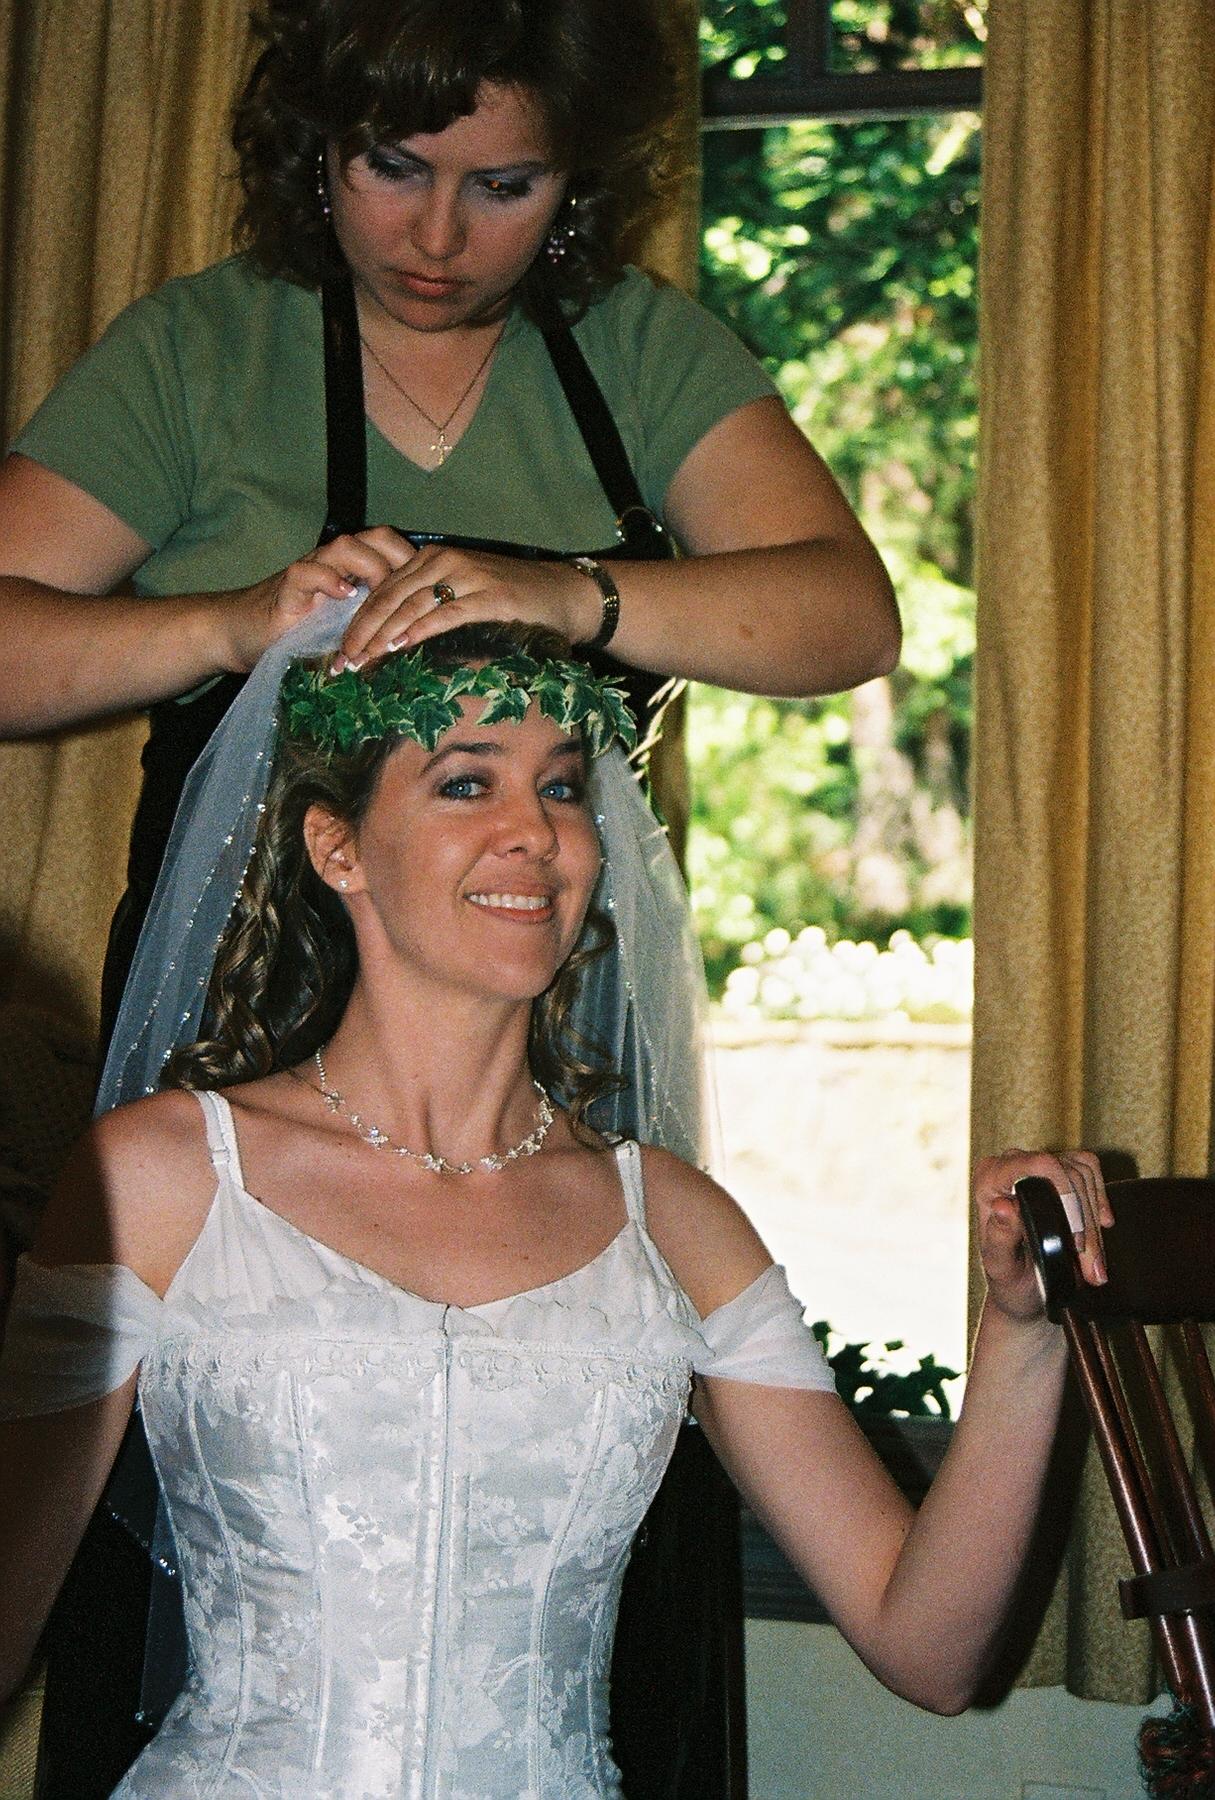 Beauty, Wedding Dresses, Fashion, dress, Bride, Hair, Nestldown, Make-up